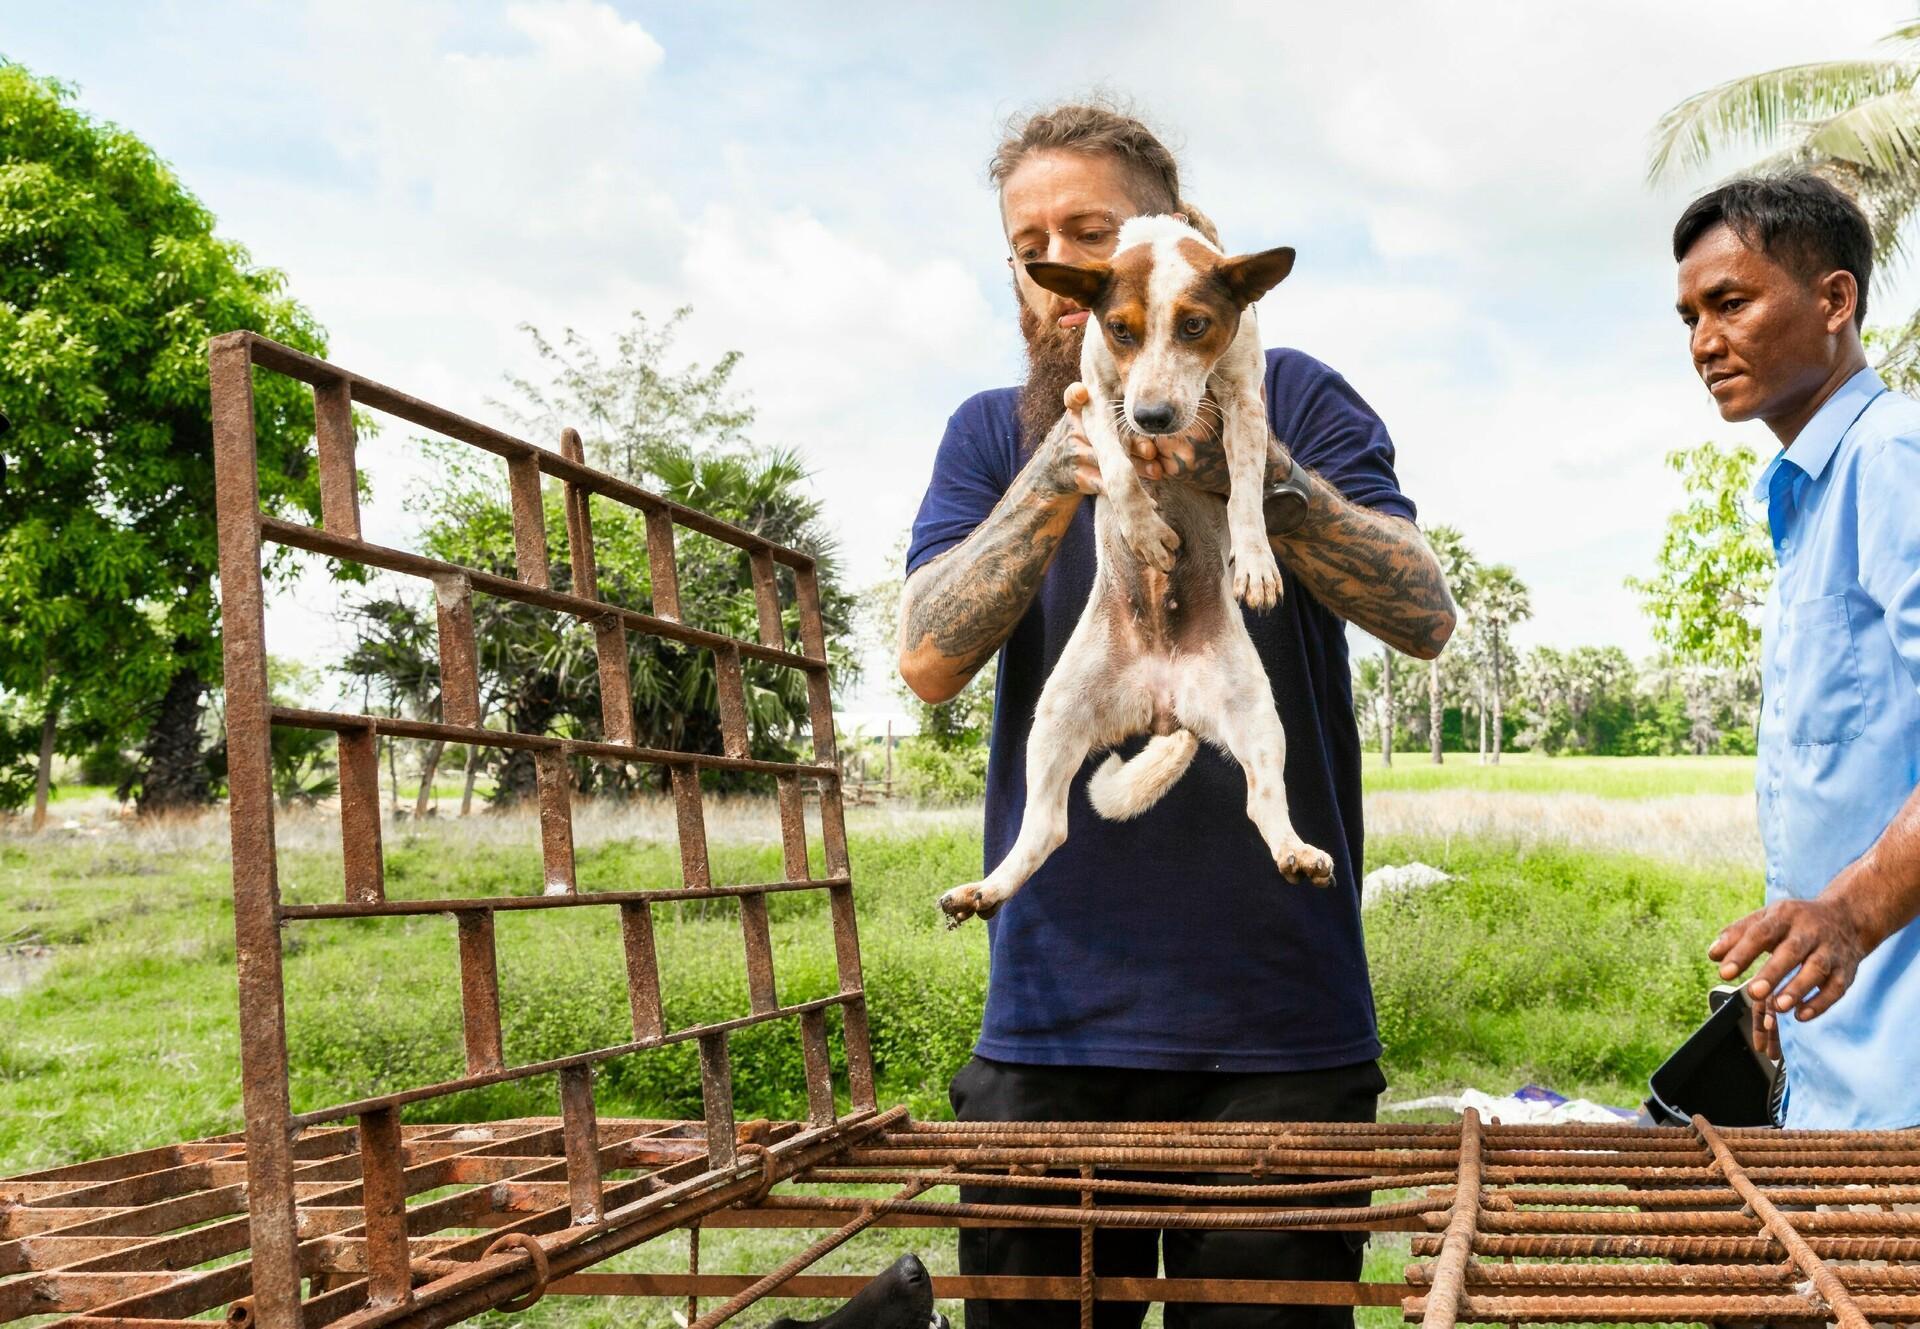 A Slaughterhouse Shutdown in Cambodia